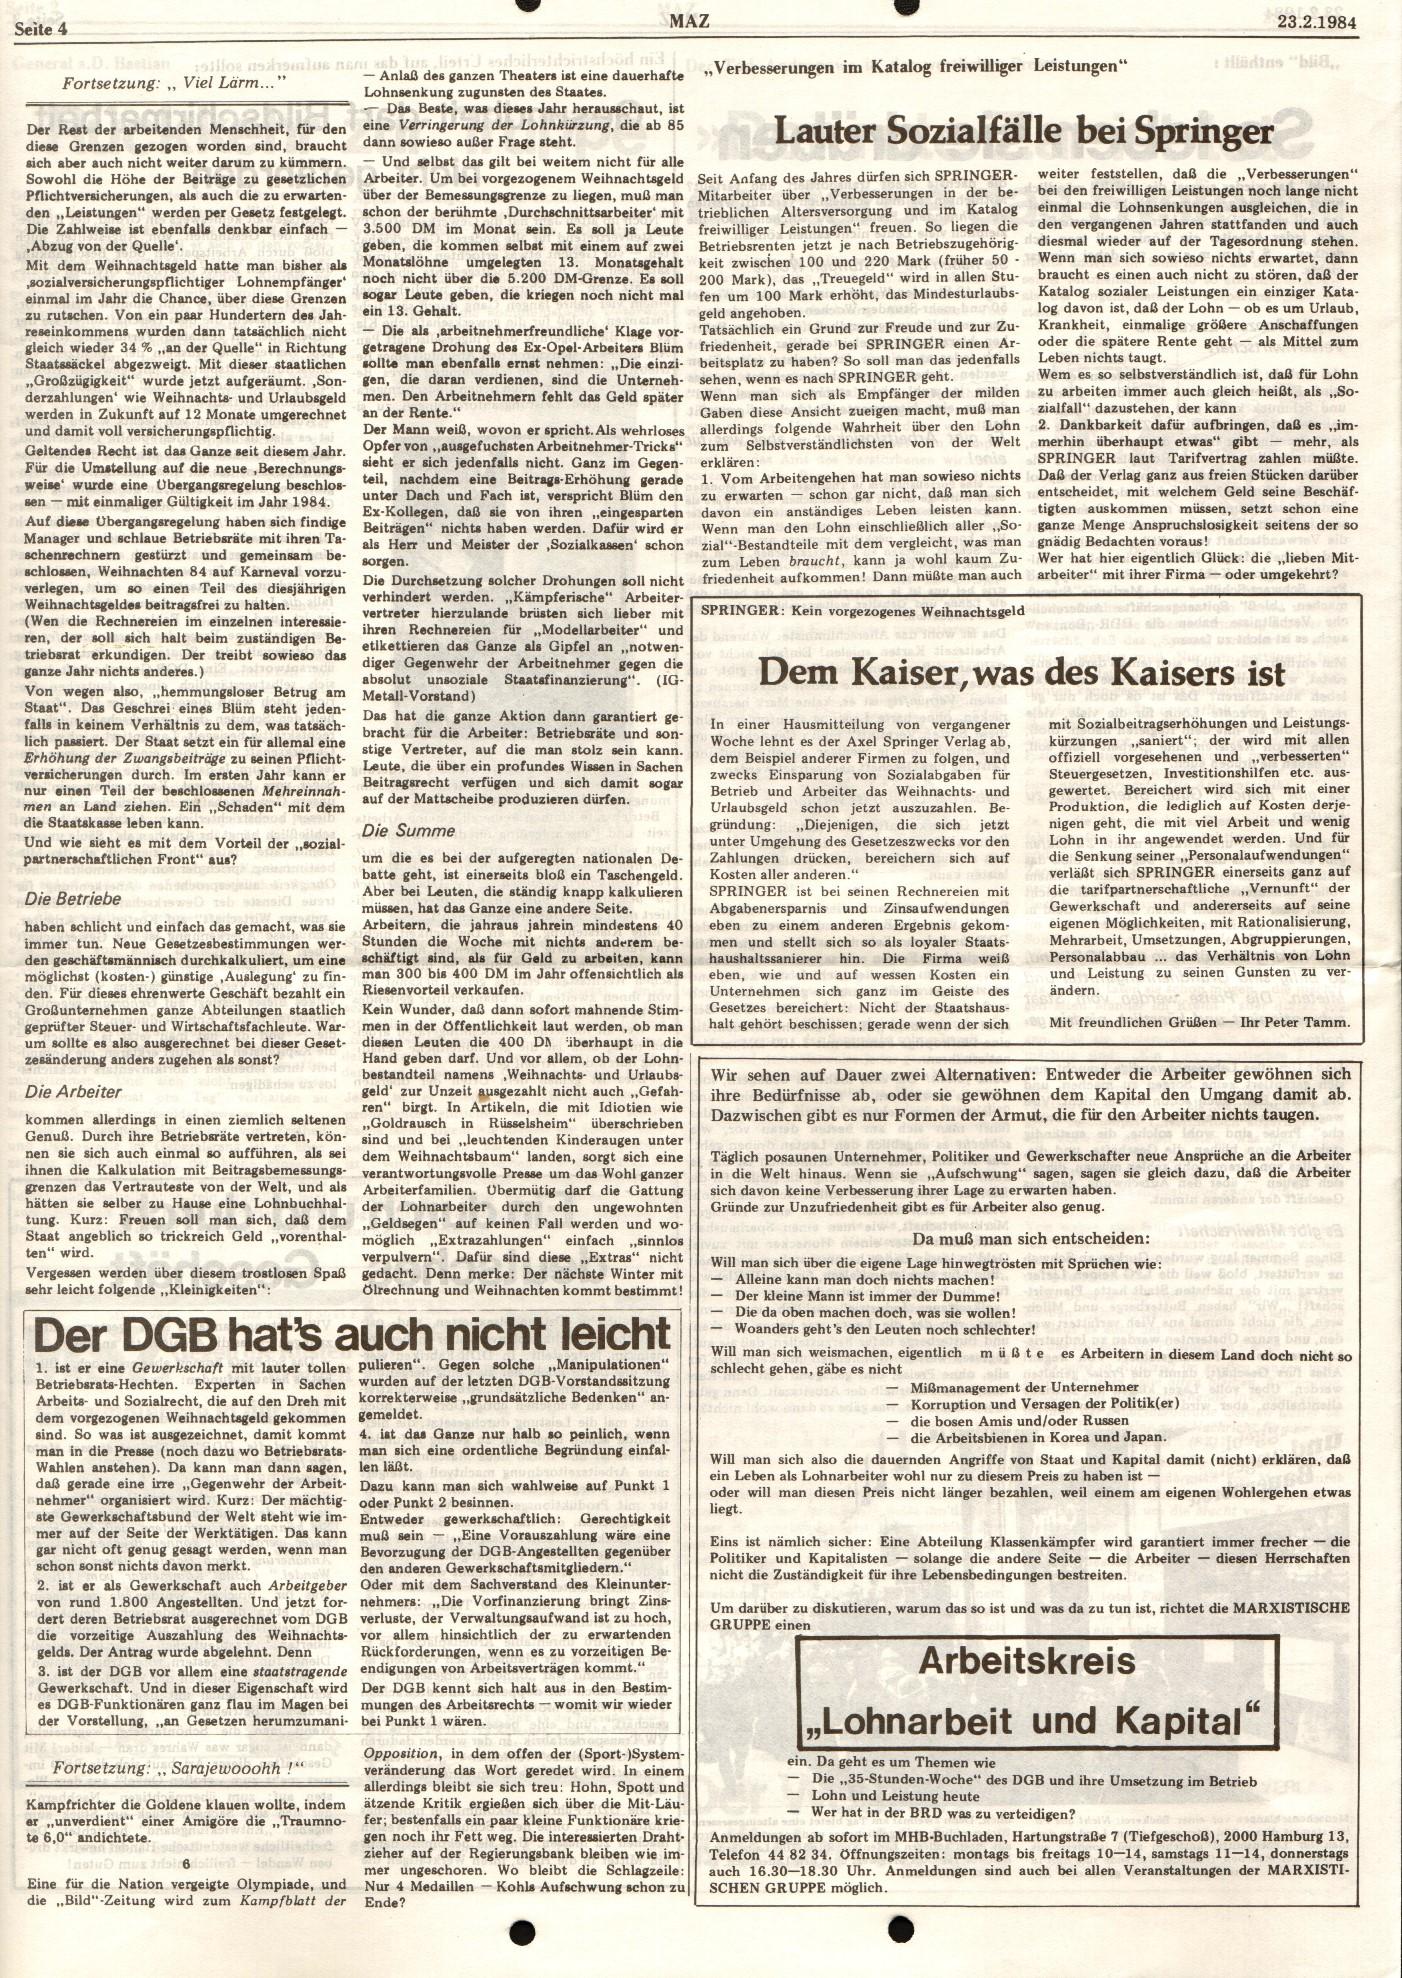 Hamburg_MG_MAZ_Druck_19840223_04